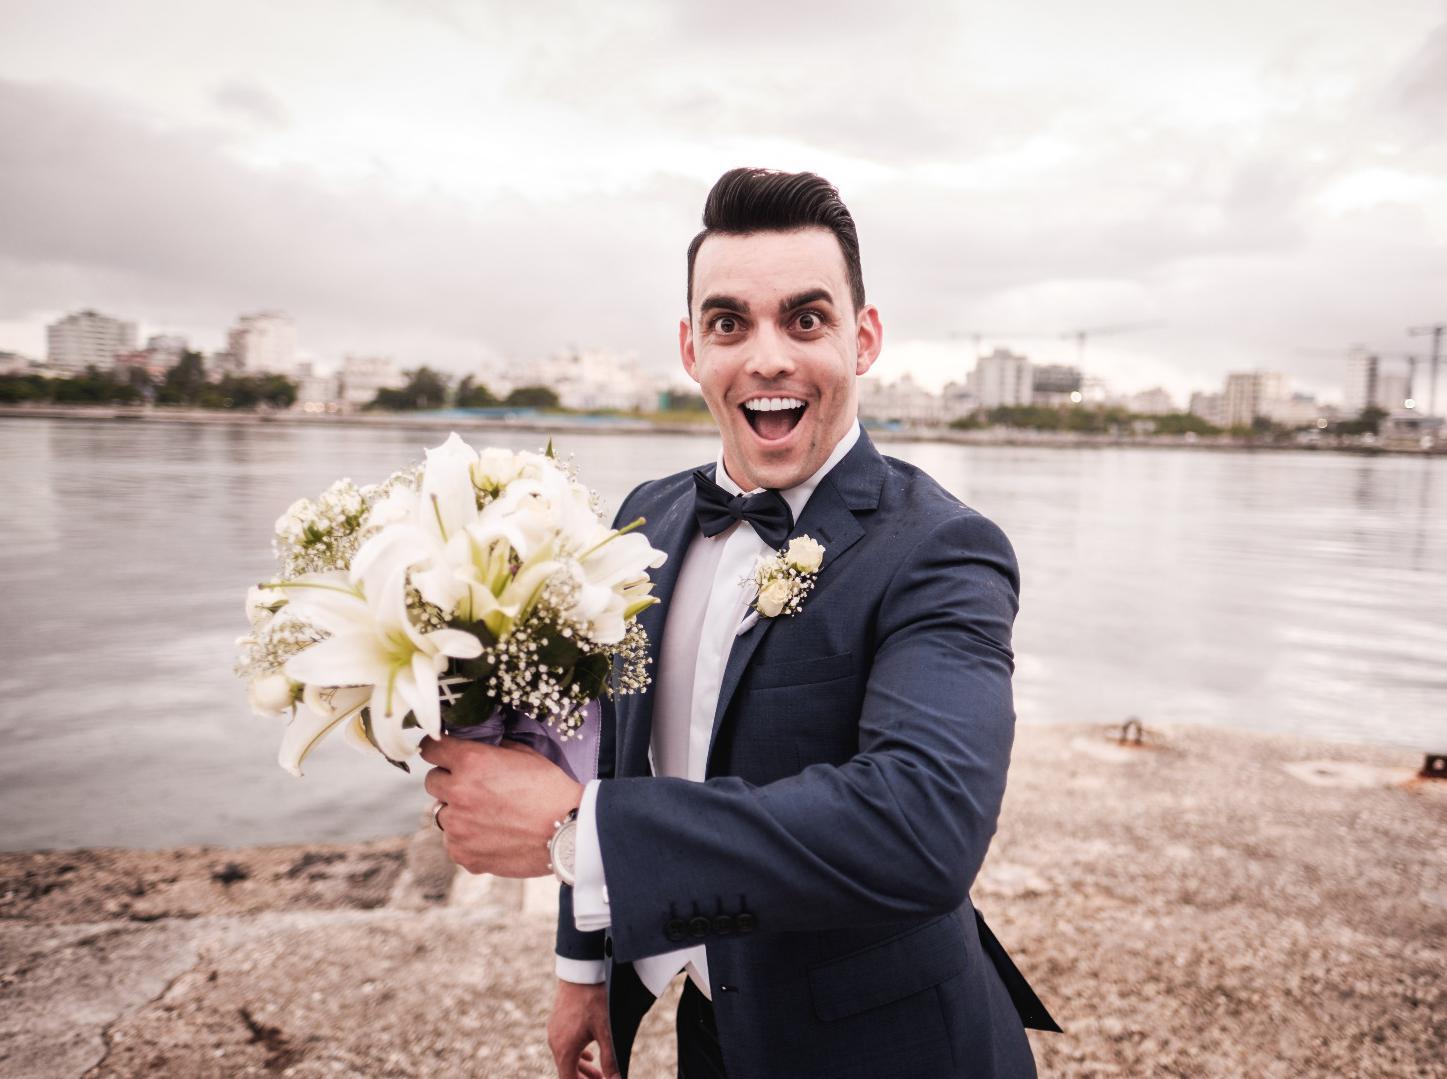 bodas-sin-clasificar-sin-tema-cuba-35681.jpg